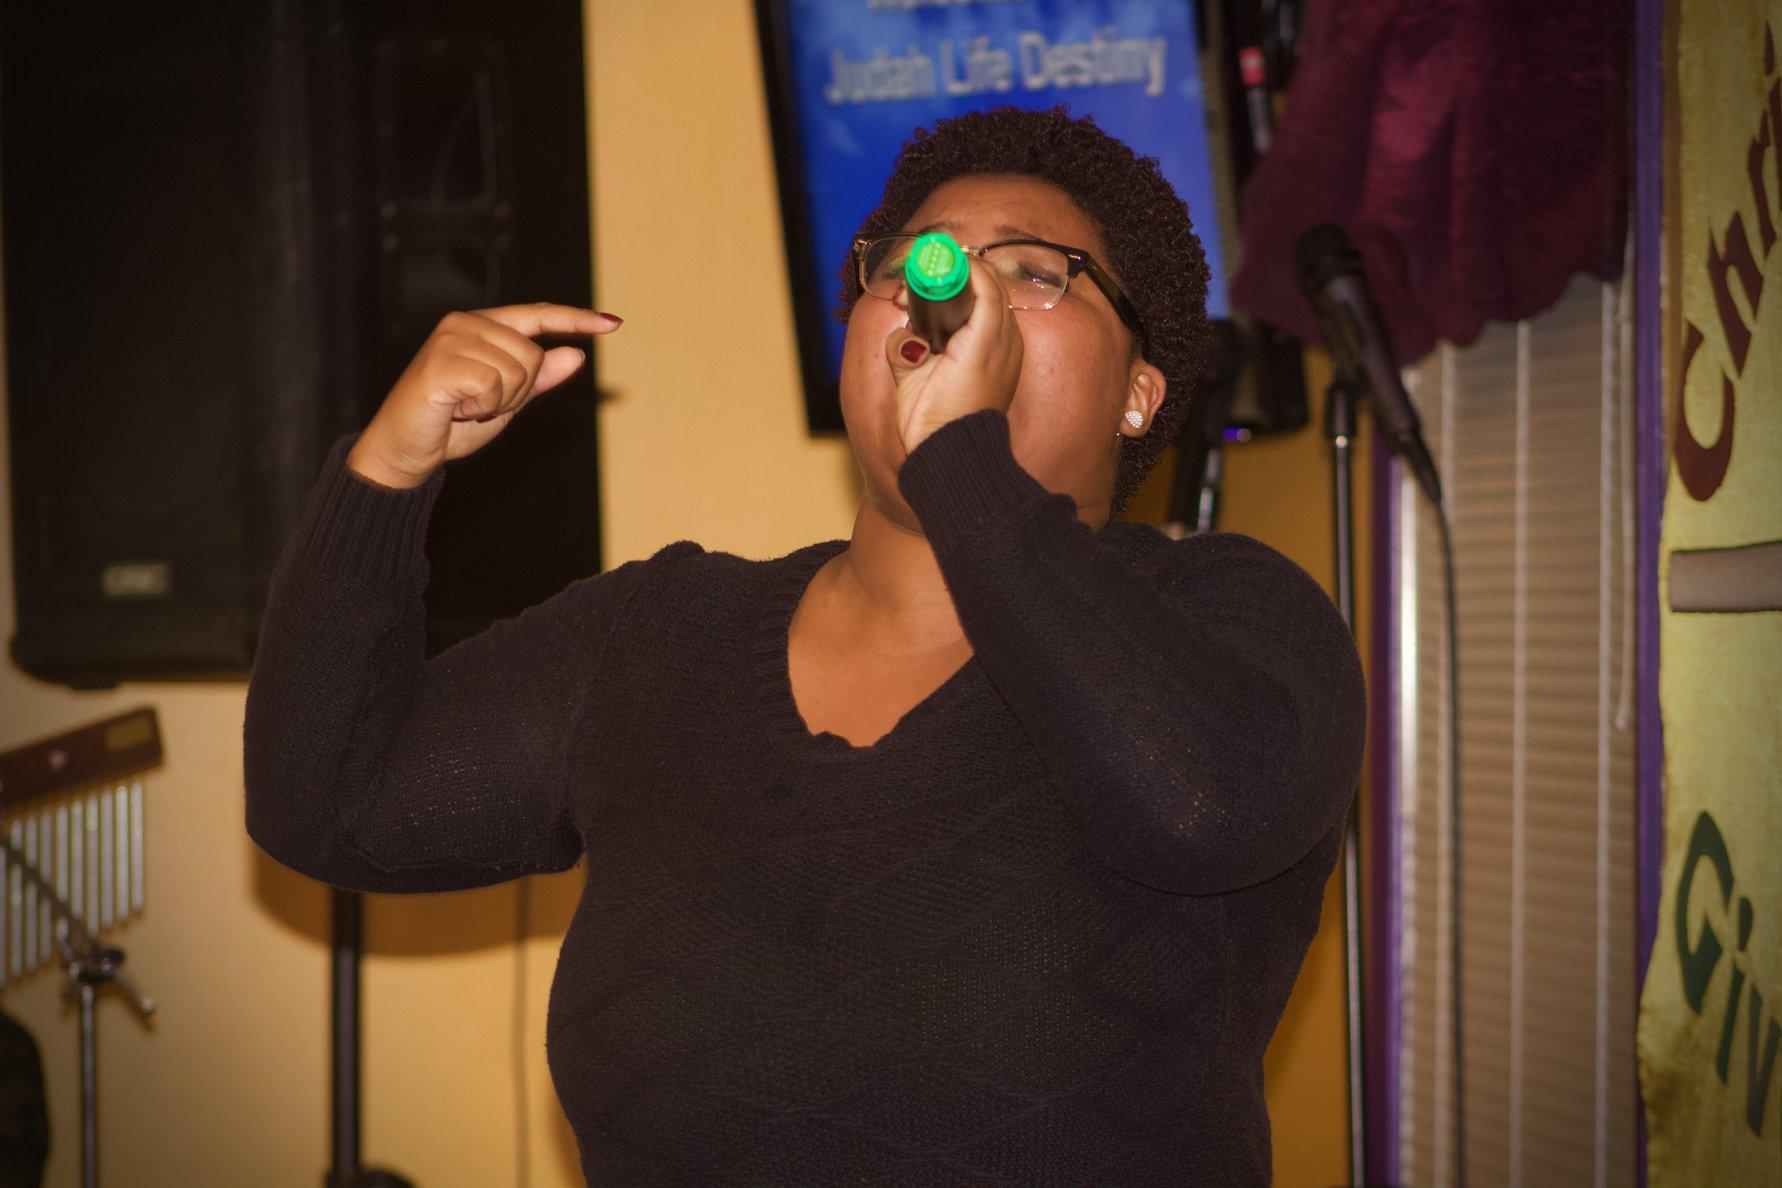 sing_laquisha